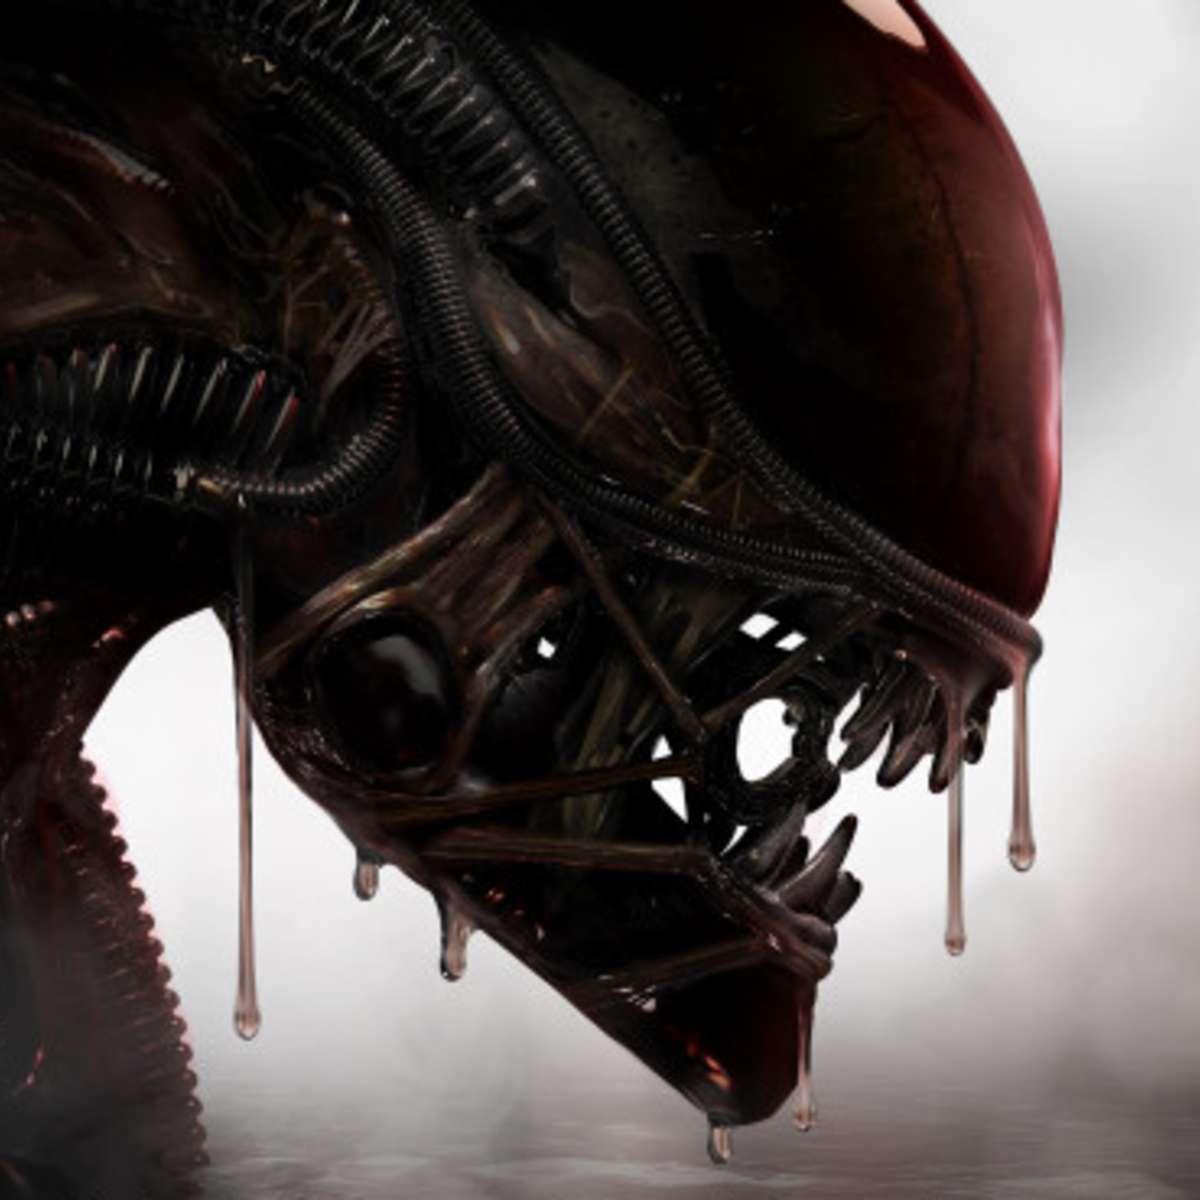 Alien: River of Pain